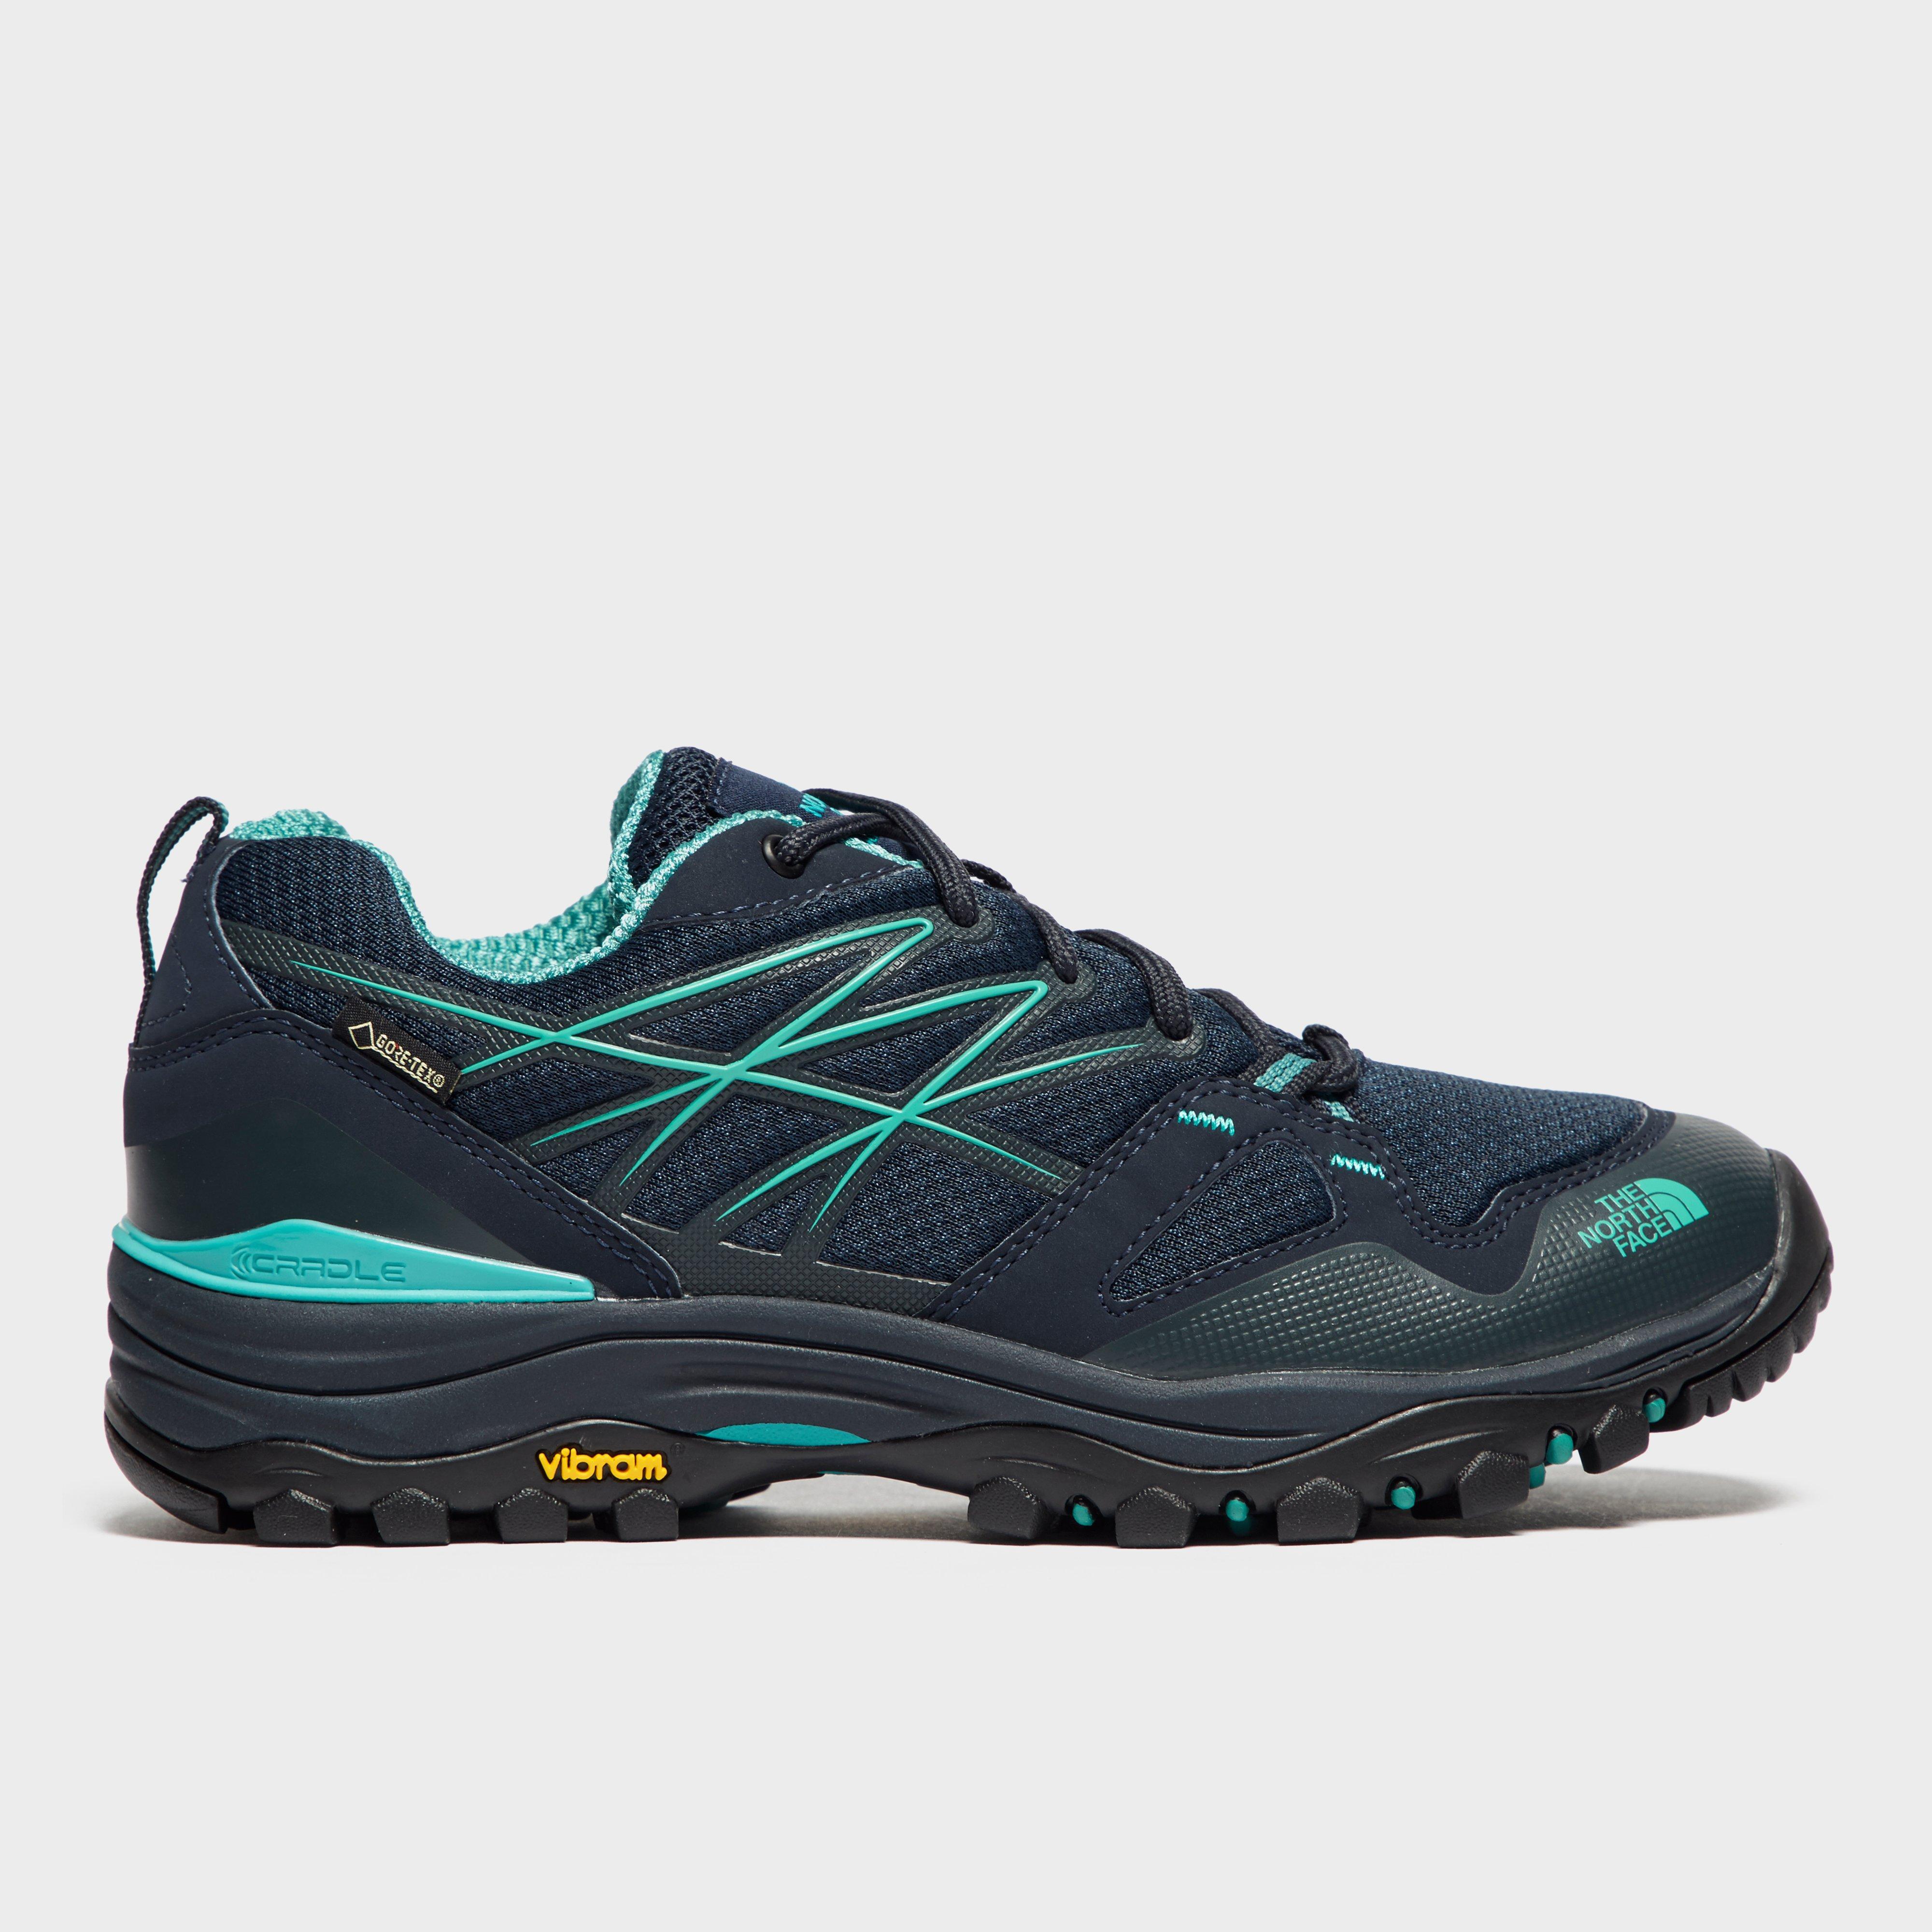 93b14315140 Women's Hedgehog Fastpack GORE-TEX® Shoes